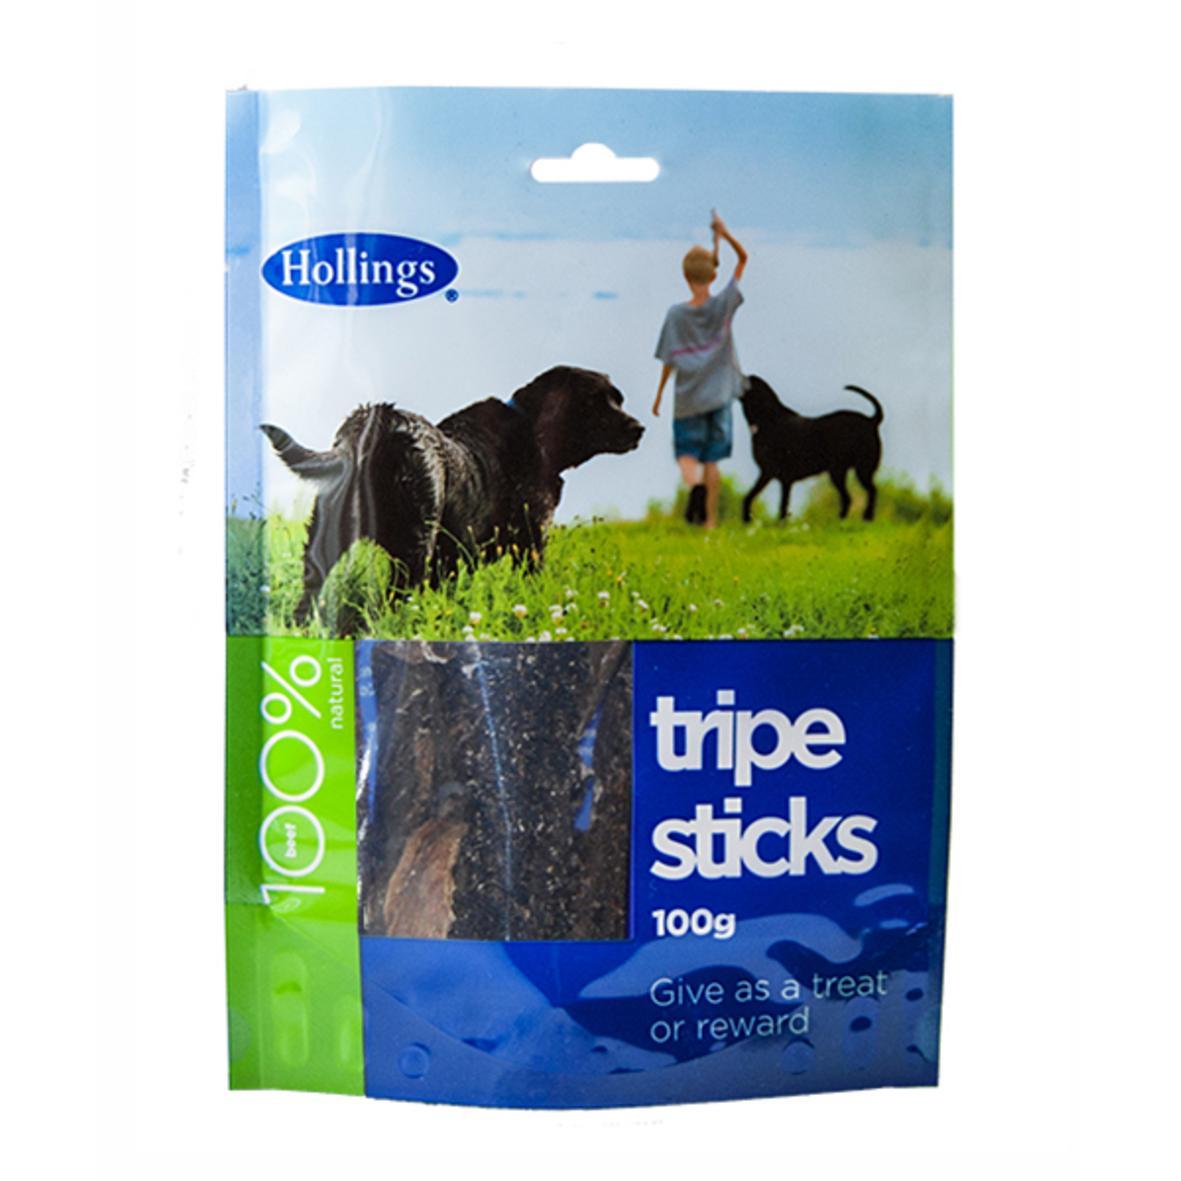 Hollings Tripe Sticks 100gm